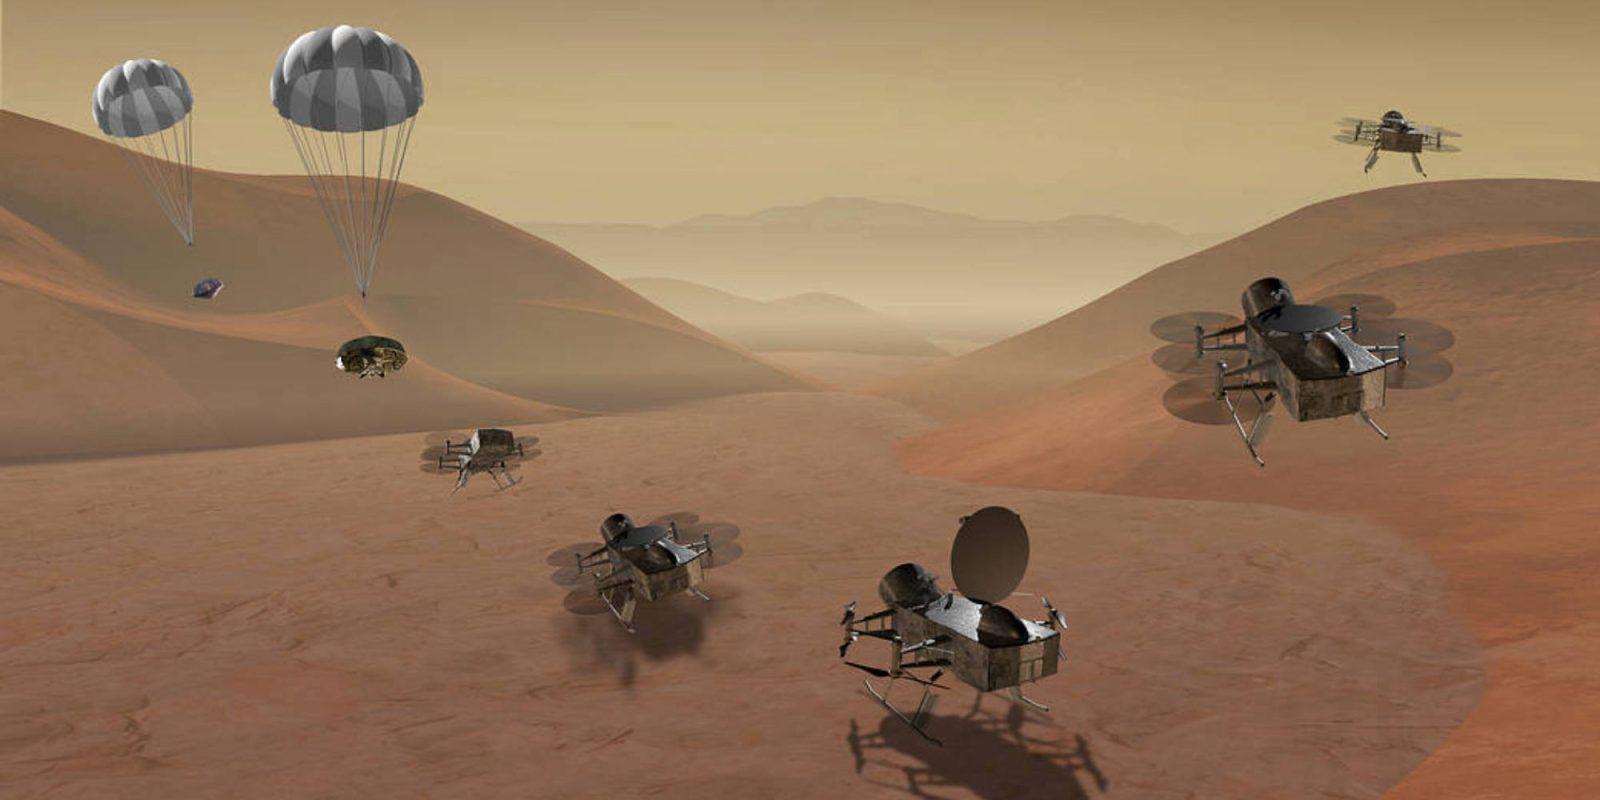 Drone Nasa Άρης: Συνεχίζει τις πτήσεις του στον Άρη το drone της Nasa